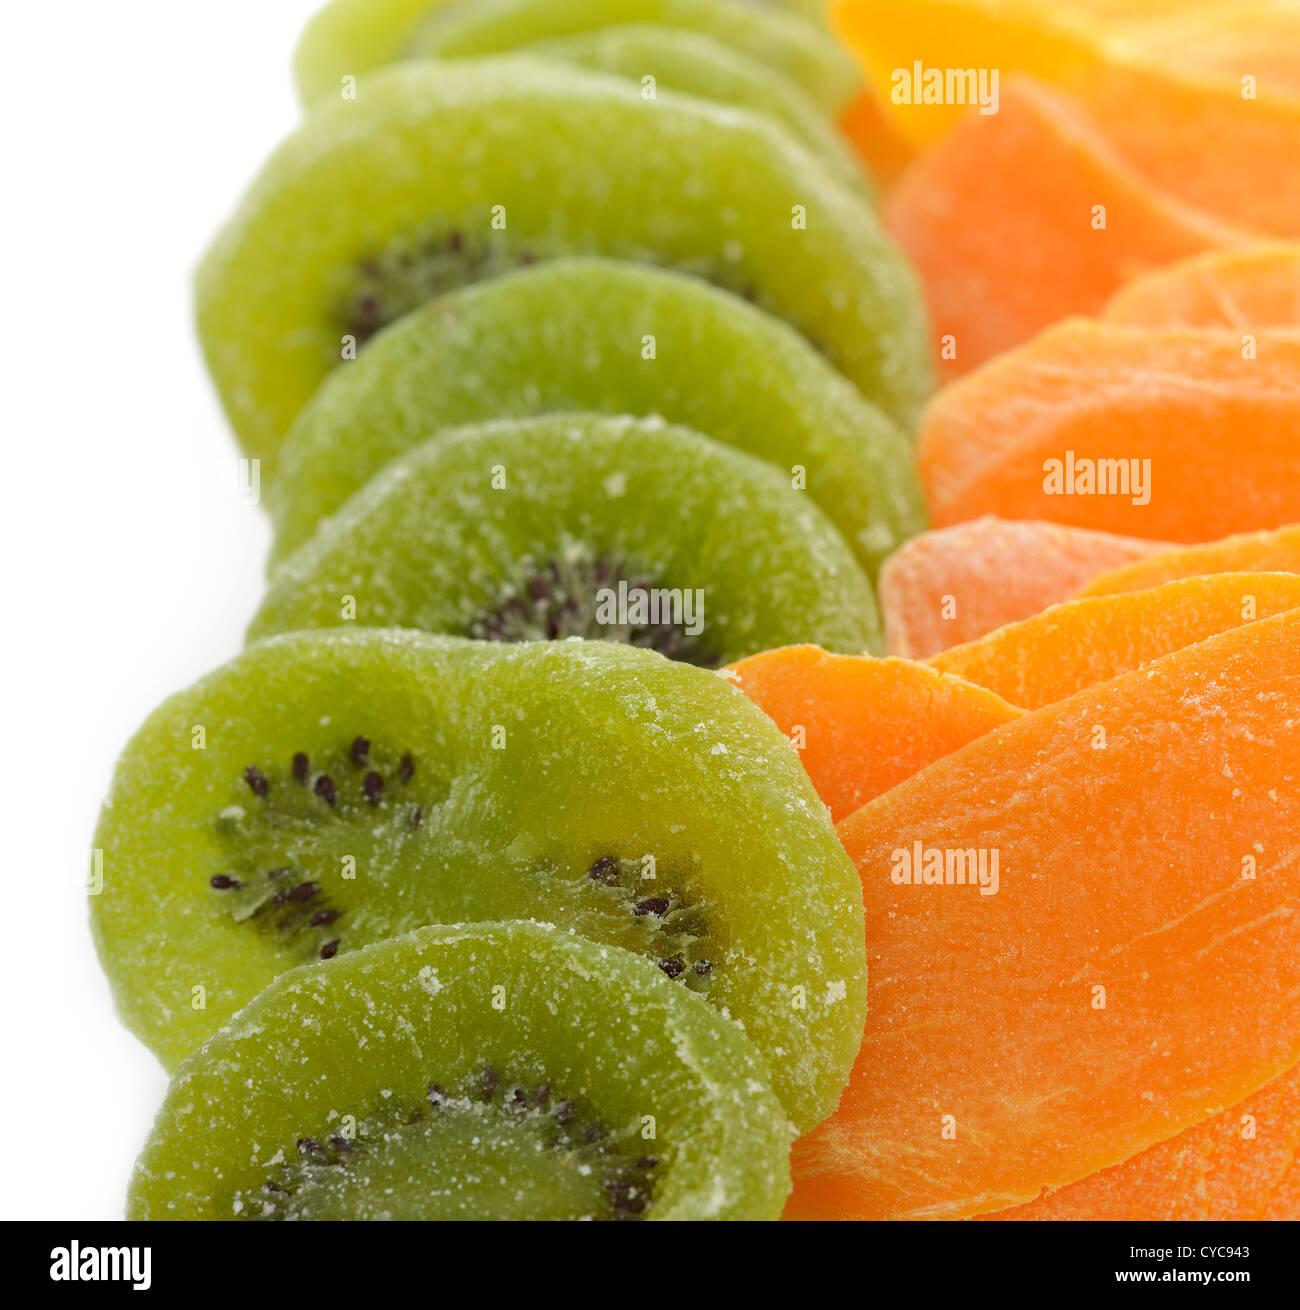 Dried Kiwi And Mango Fruits,Close Up - Stock Image